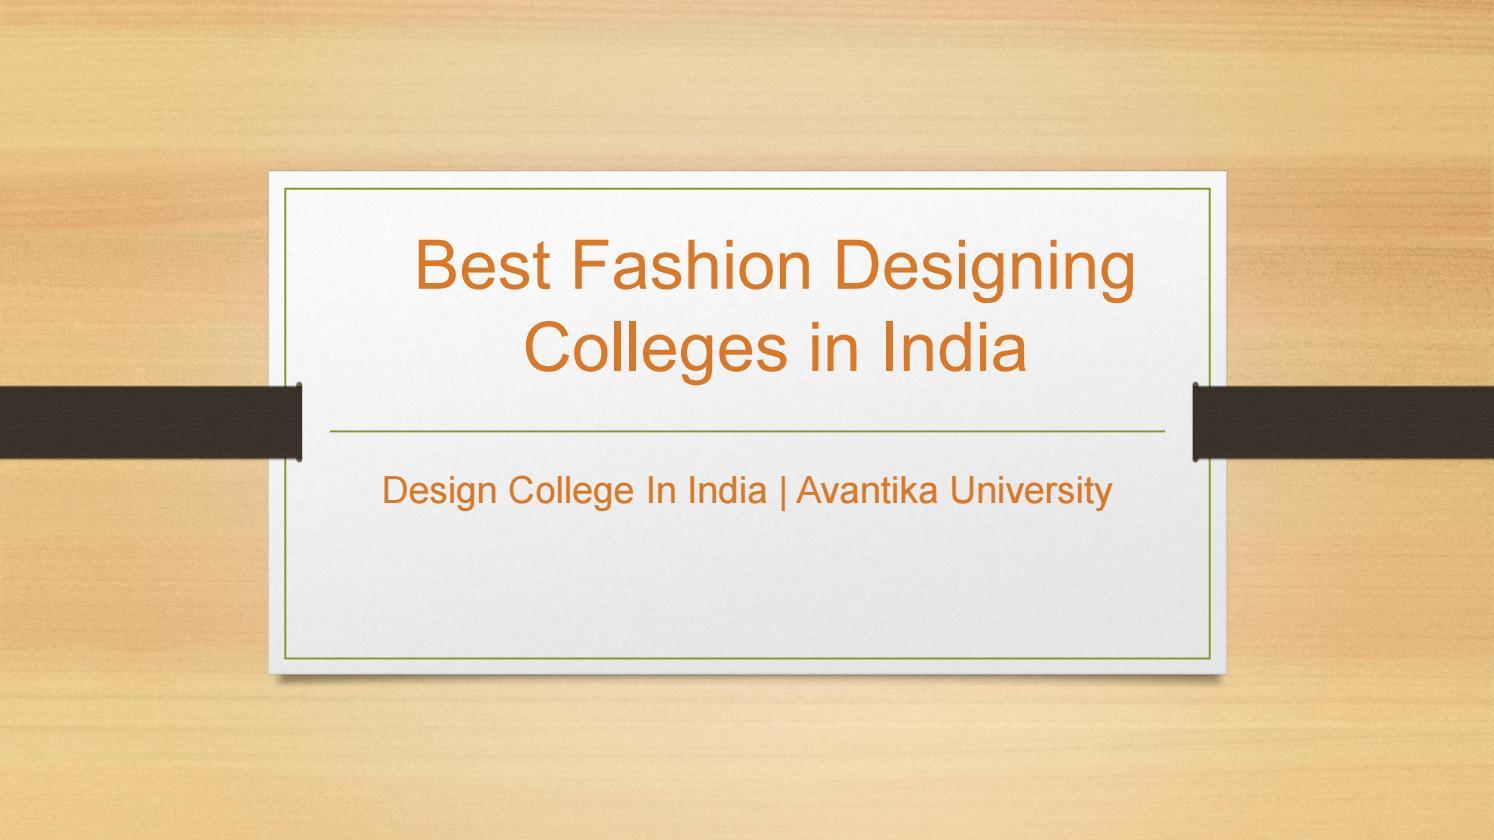 Best Fashion Designing Colleges In India Avantika University By Avantika University Issuu